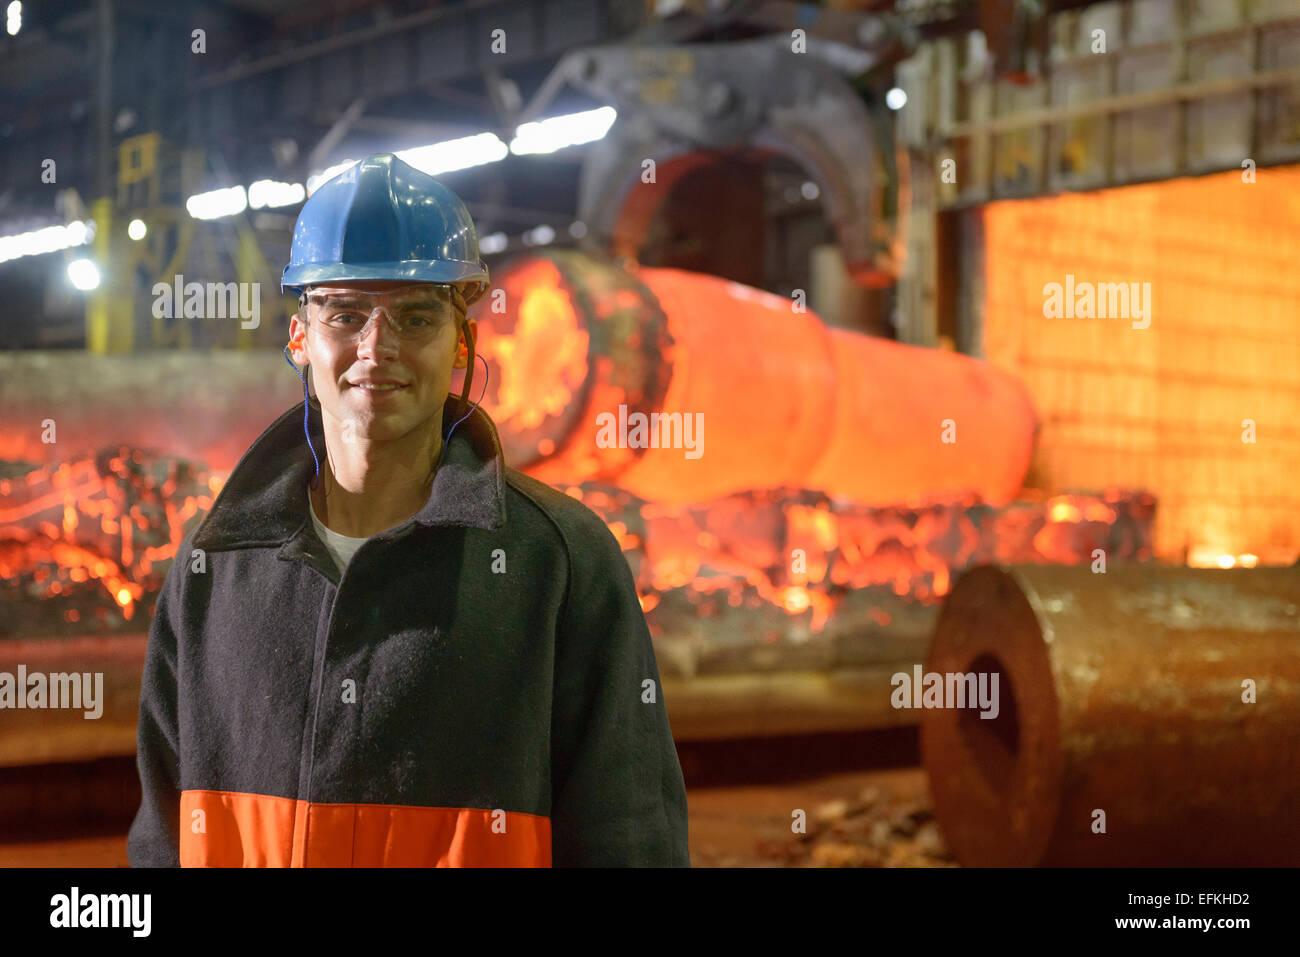 Portrait of steelworker apprentice in steelworks - Stock Image